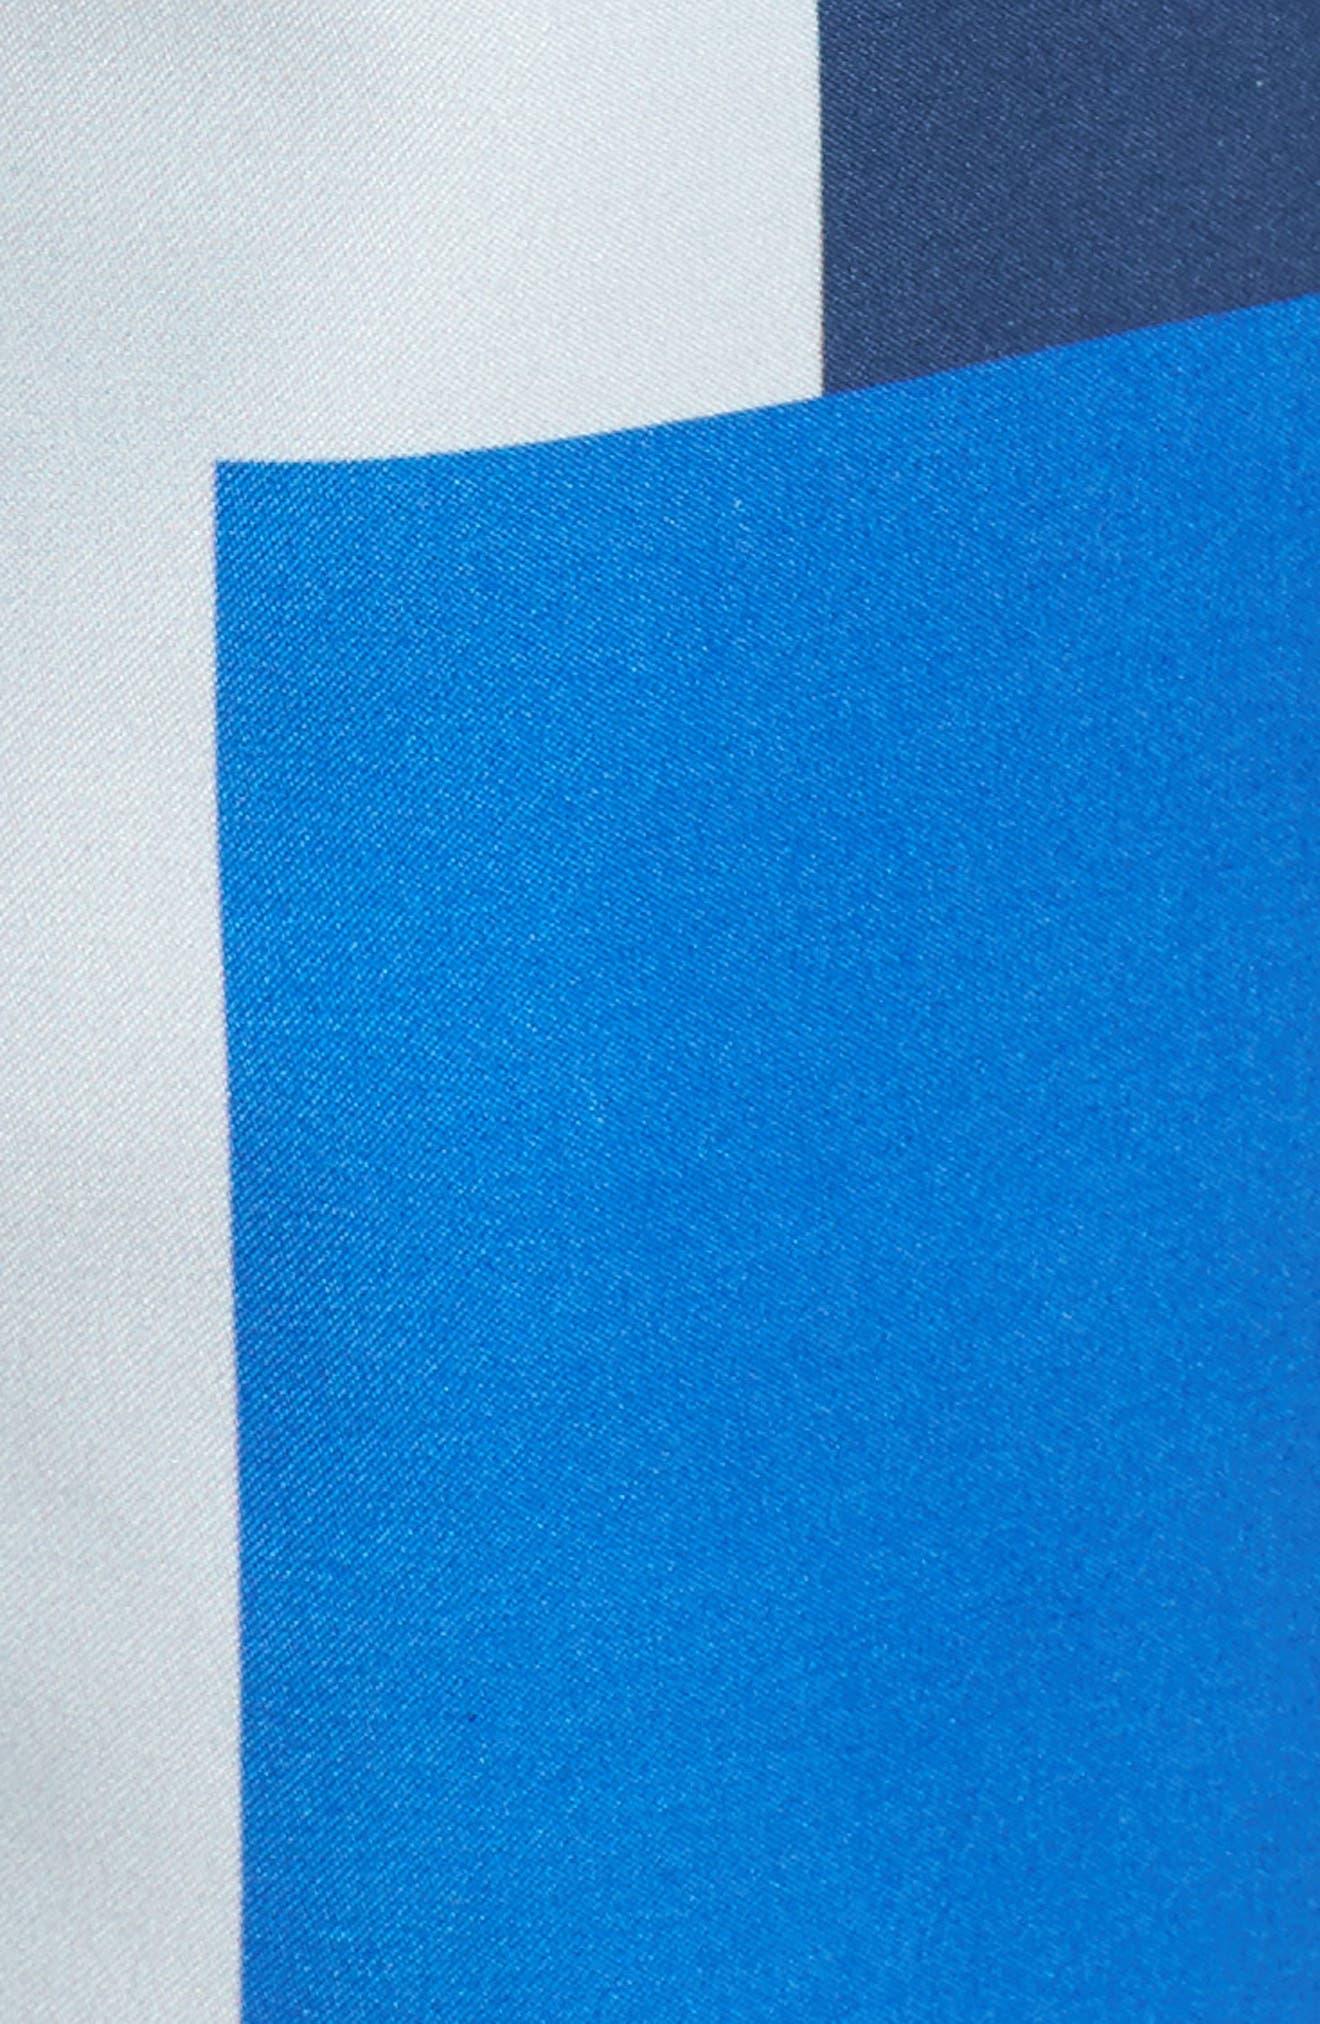 Javan Swim Trunks,                             Alternate thumbnail 5, color,                             BLUE